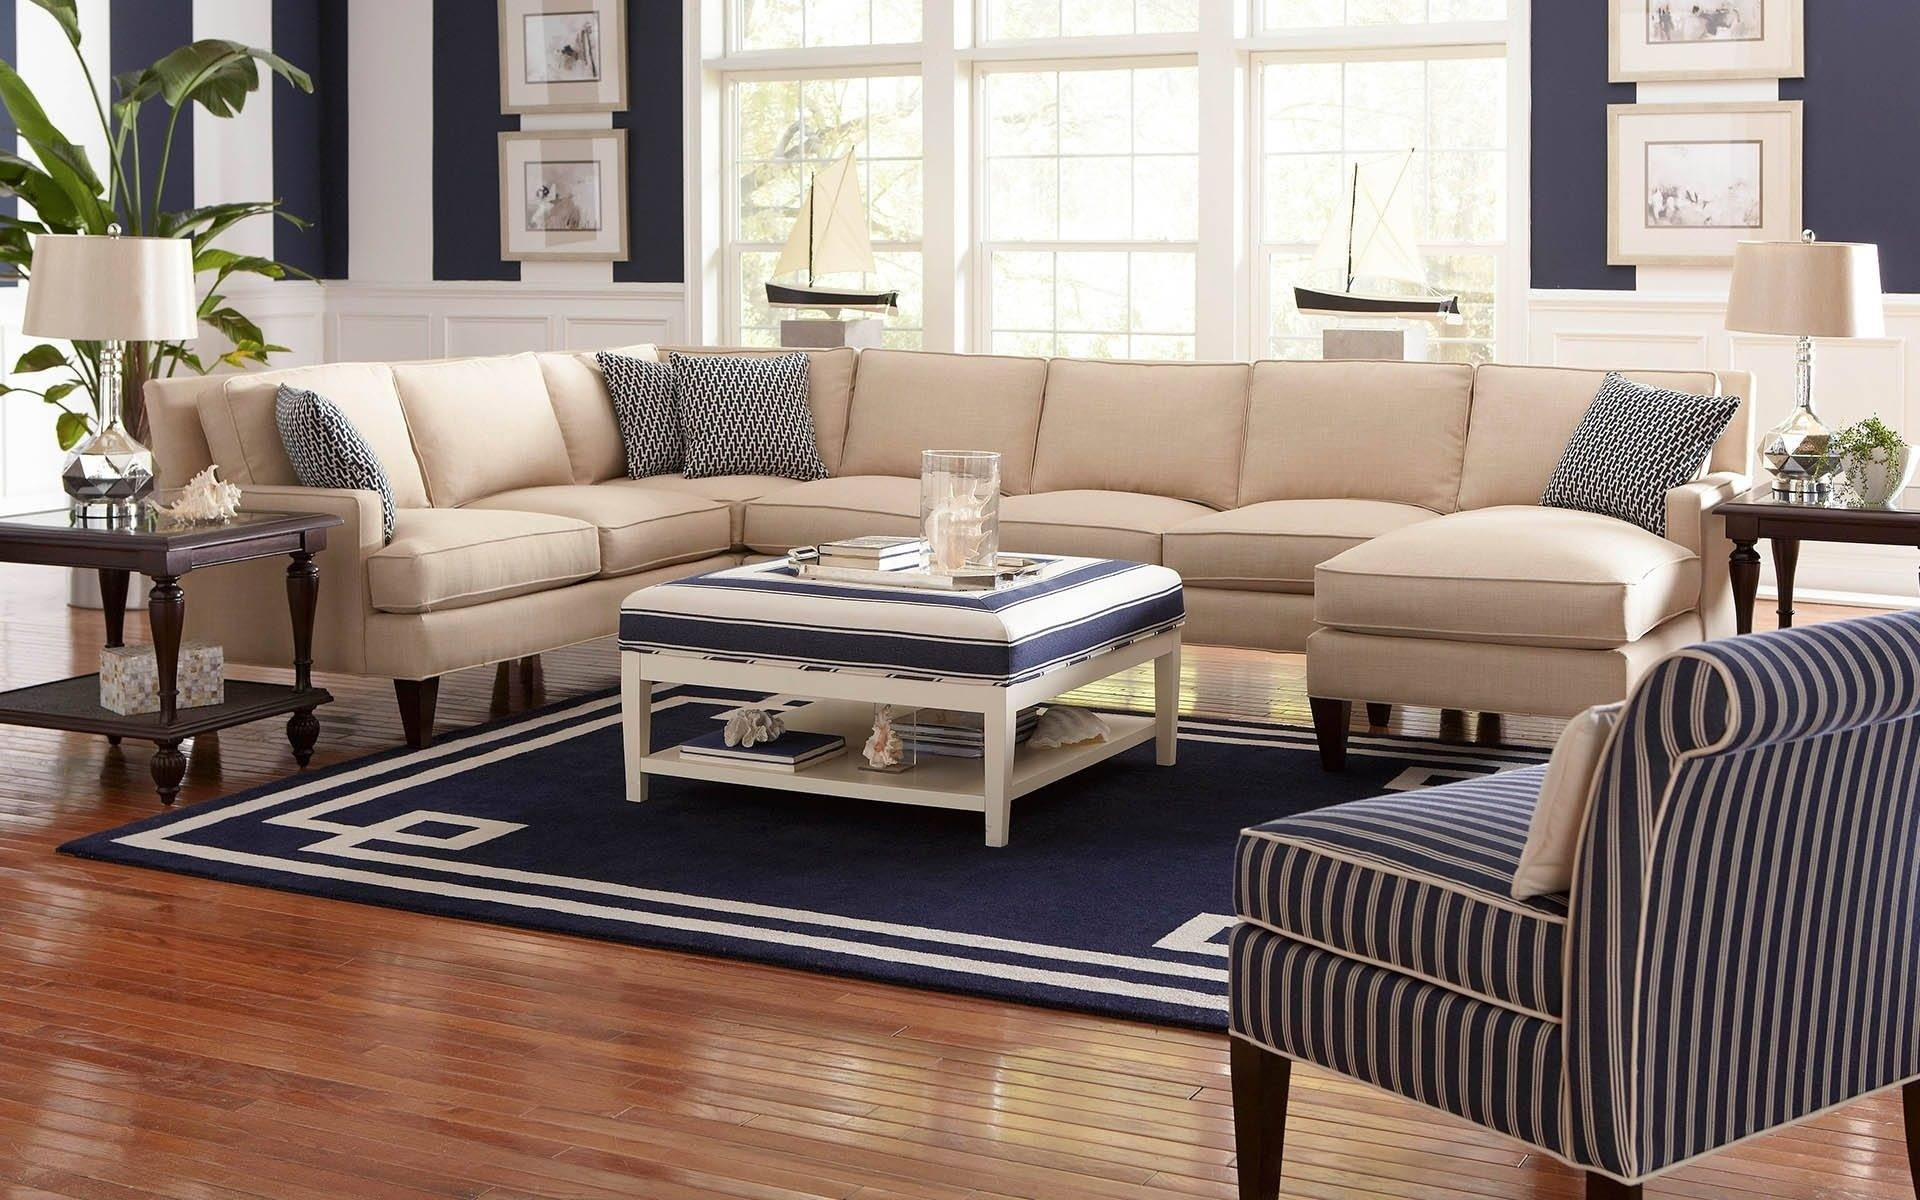 Sleeper Sofa Austin Tx | Centerfieldbar with Austin Sleeper Sofas (Image 9 of 15)